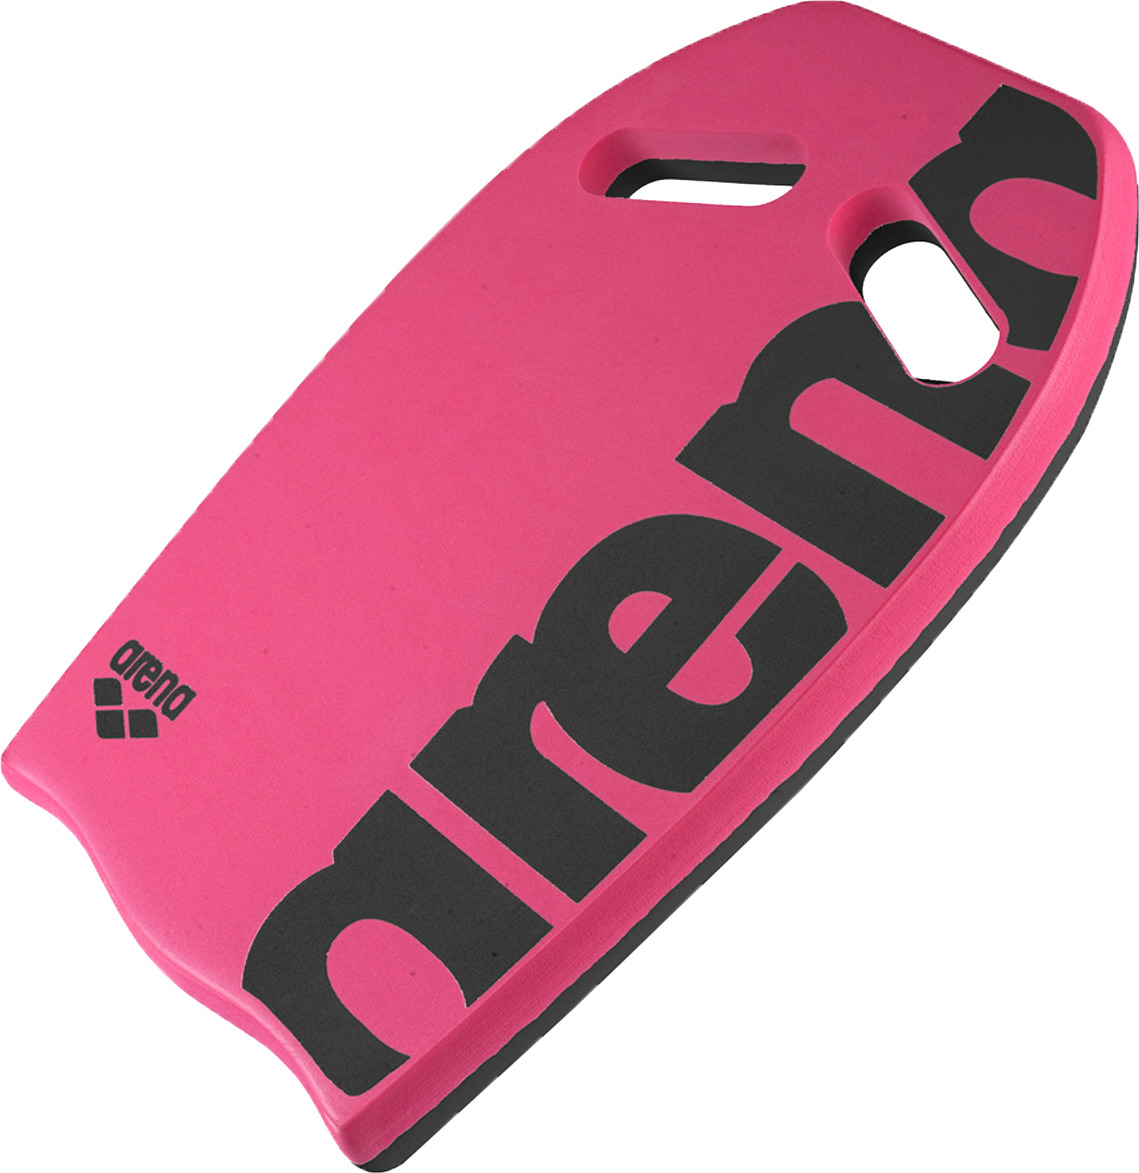 Доска для плавания Arena Kickboard, цвет: розовый. 95275 90 шапочка для плавания arena polyester  цвет  темно синий